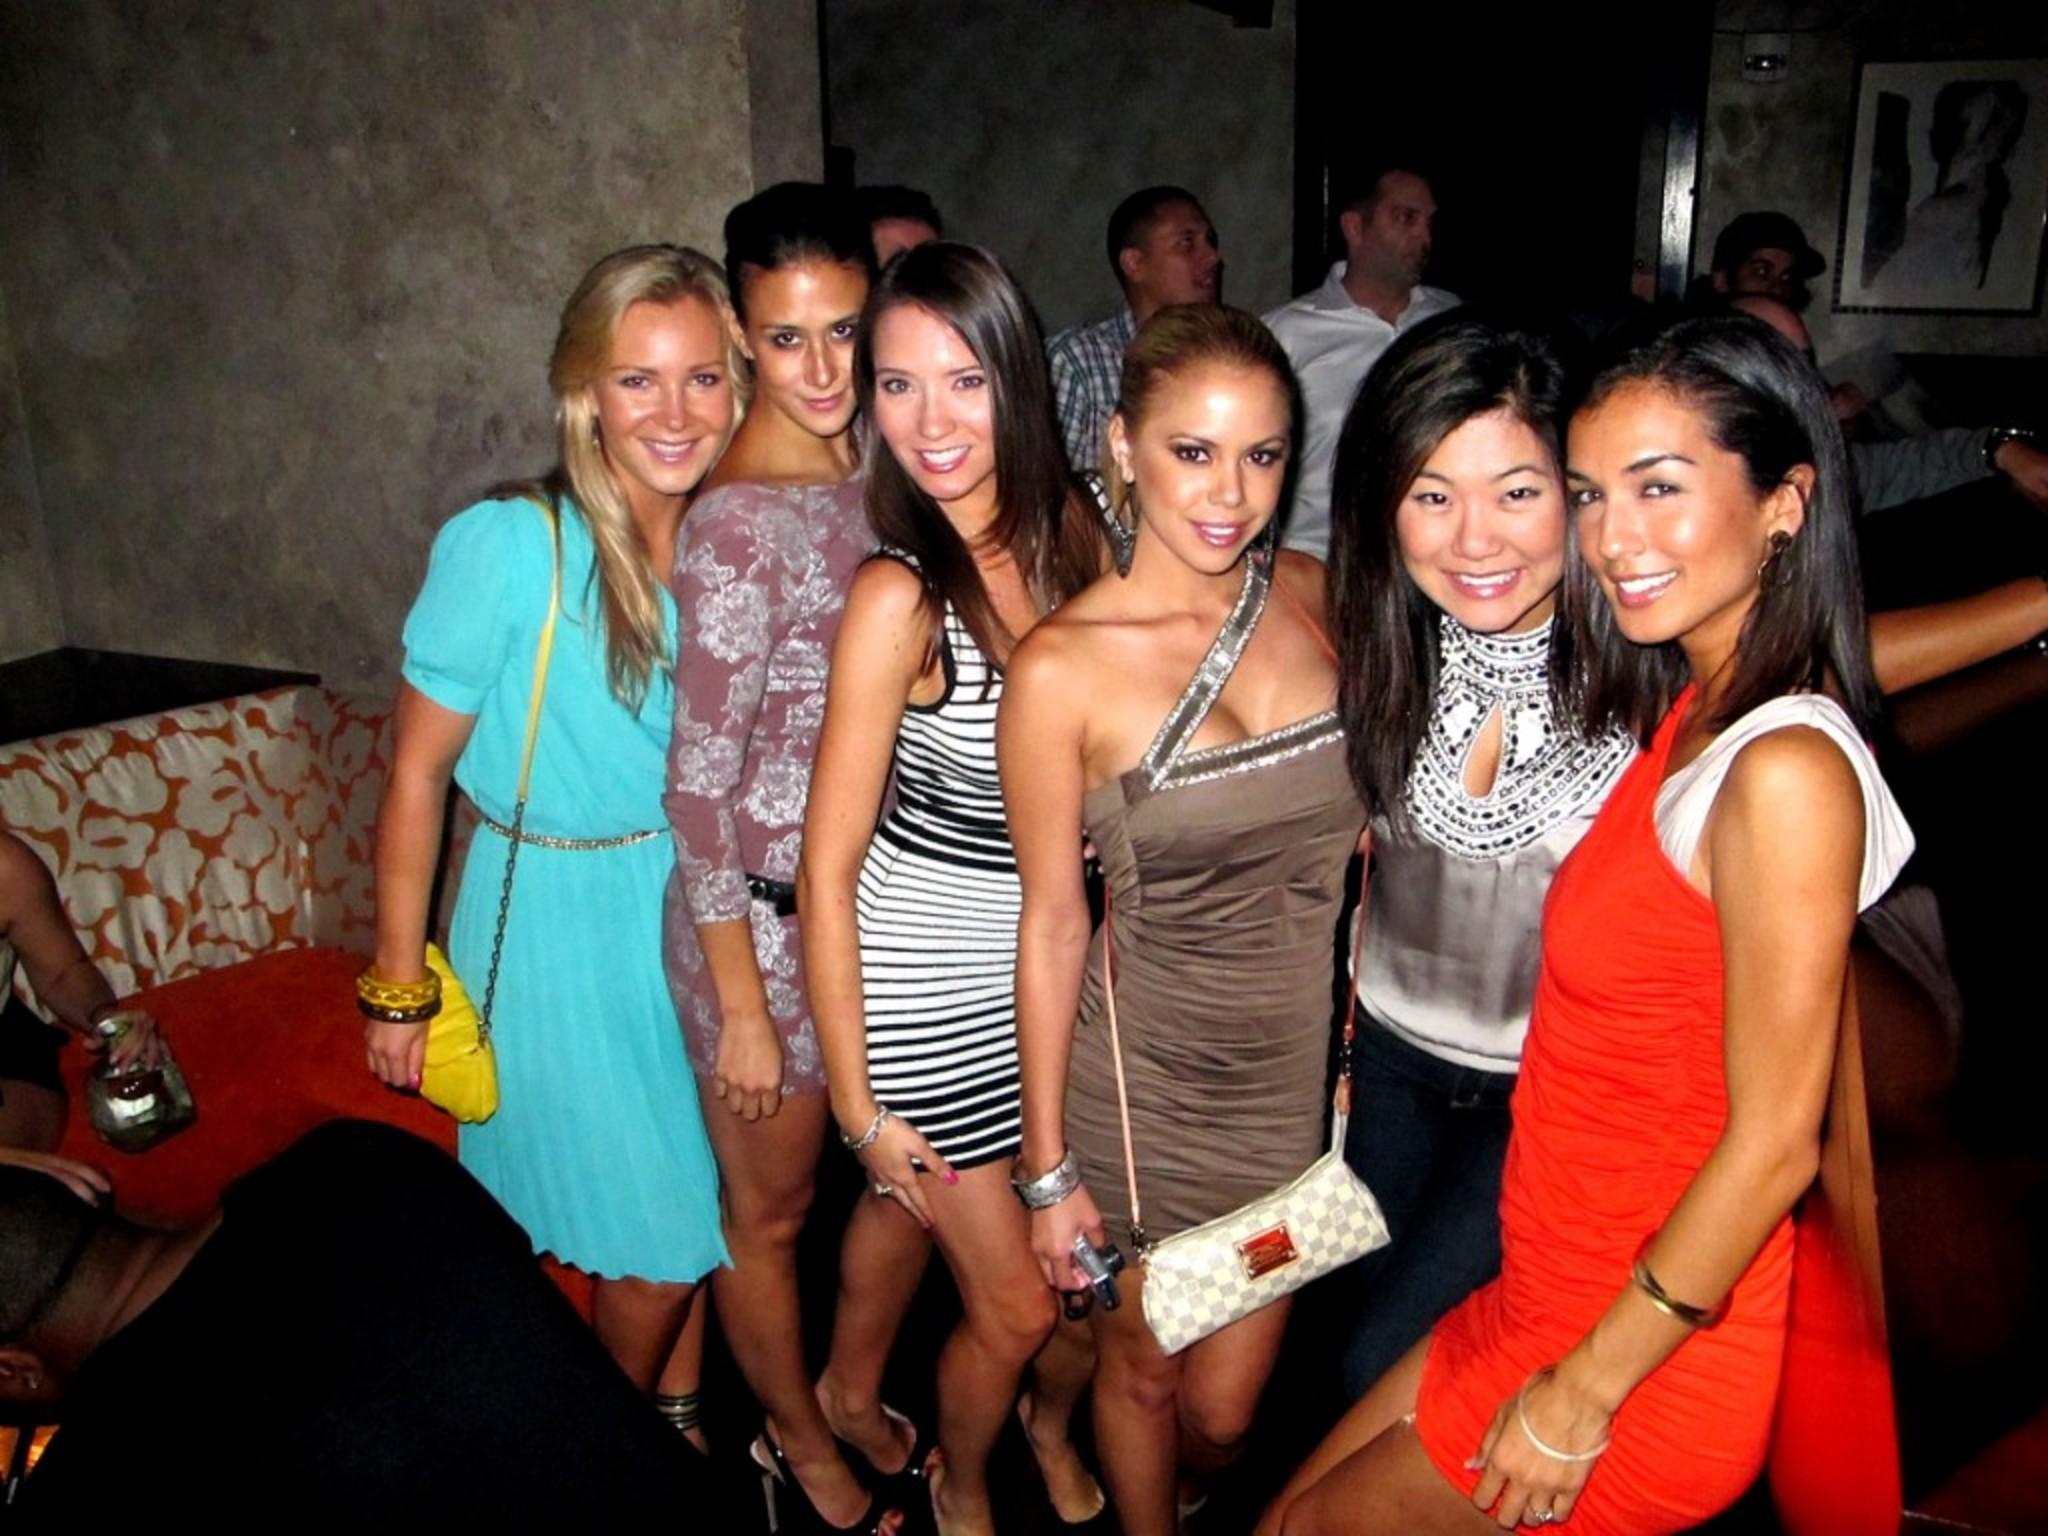 Night Girls Norway In In Club Bergen